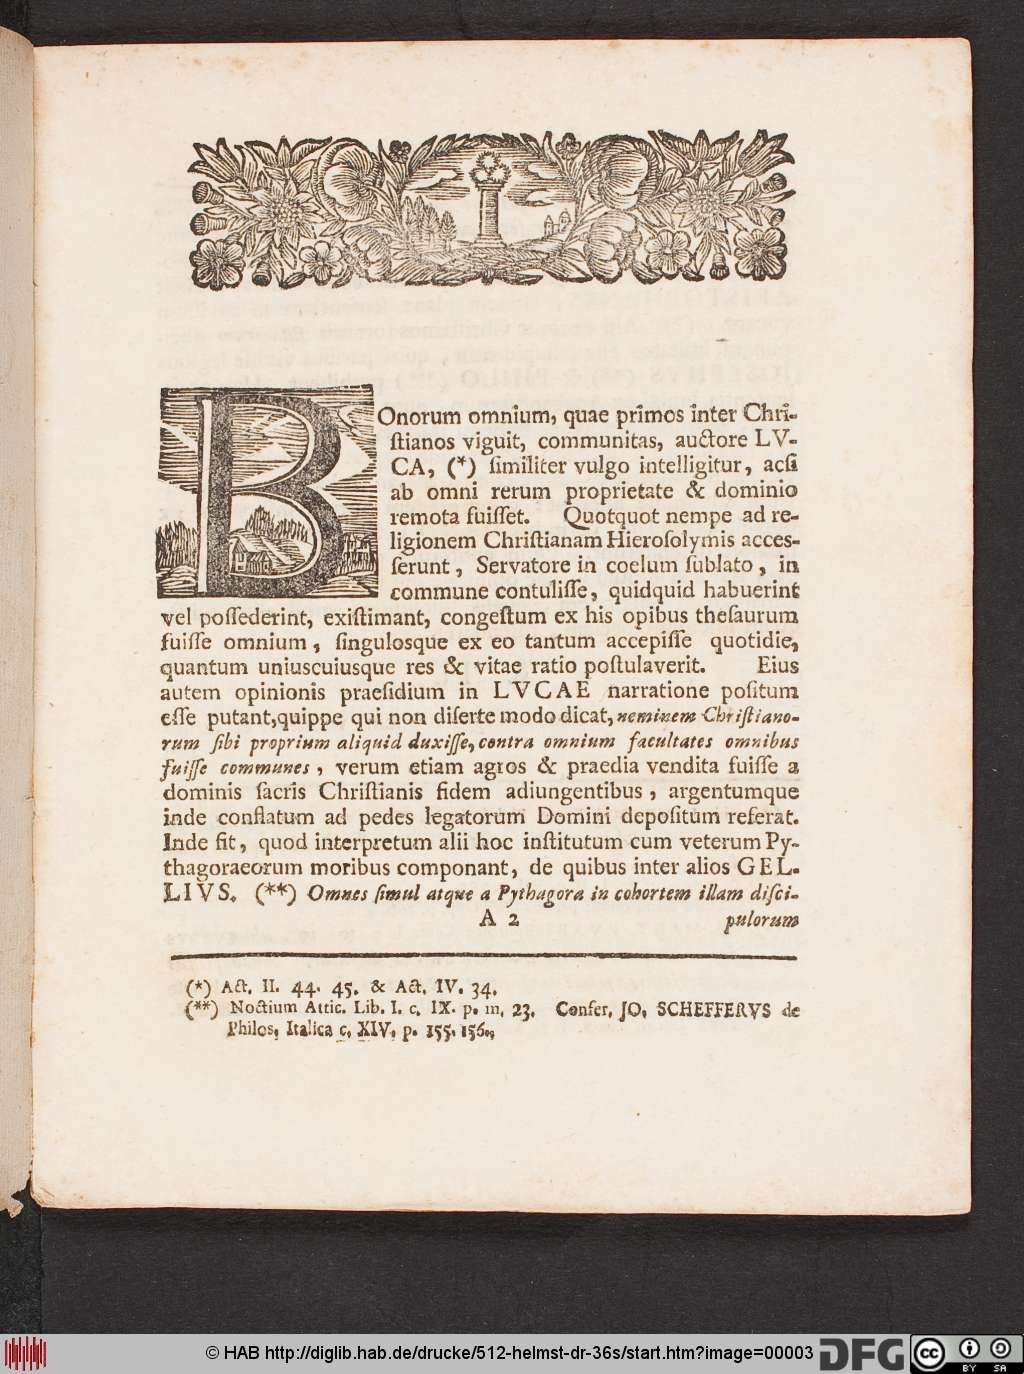 http://diglib.hab.de/drucke/512-helmst-dr-36s/00003.jpg